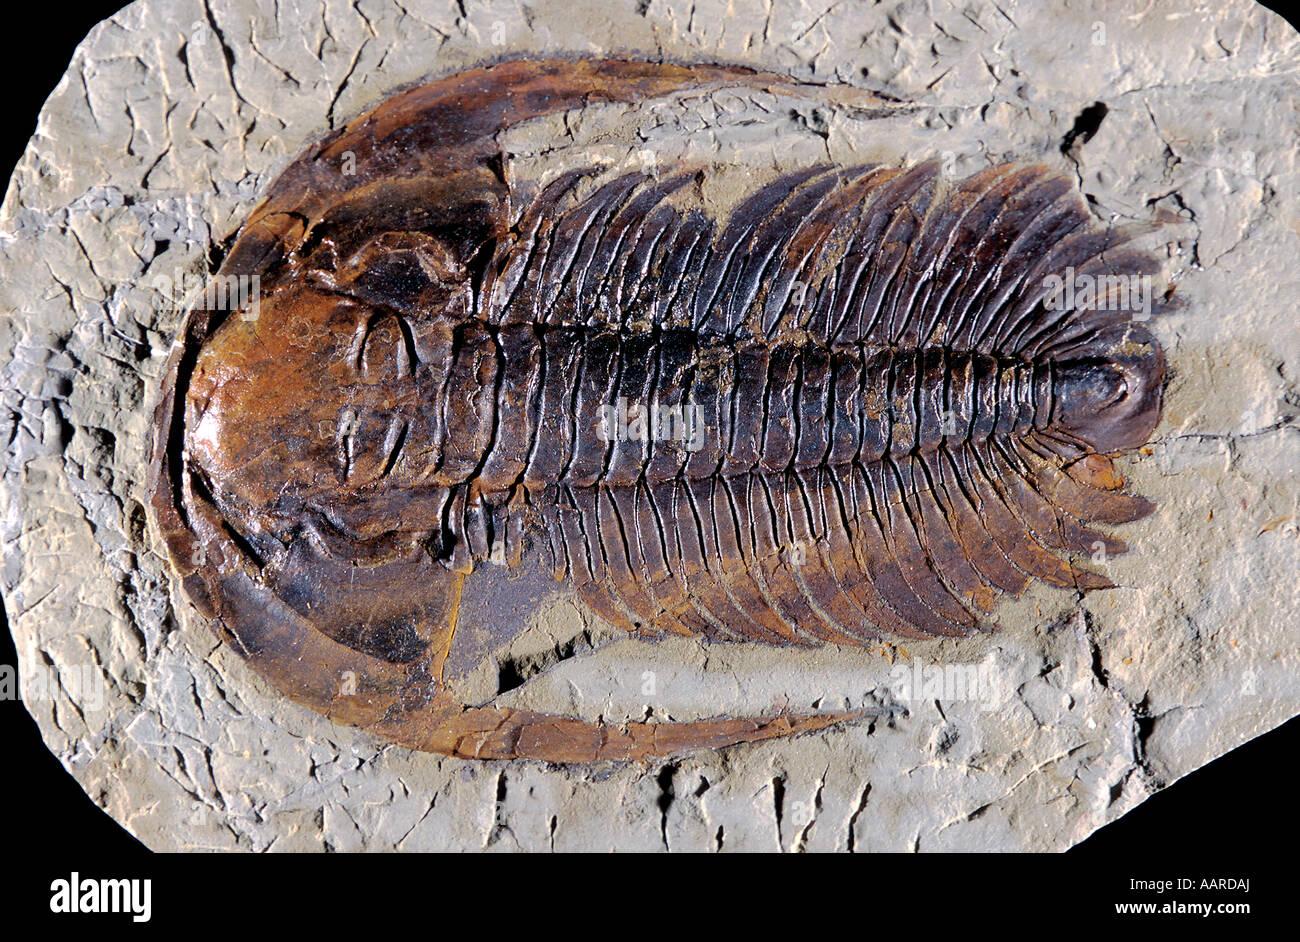 Trilobite Fossil Acadoparadoxides briareus Middle Cambrian Moroccan Sahara - Stock Image